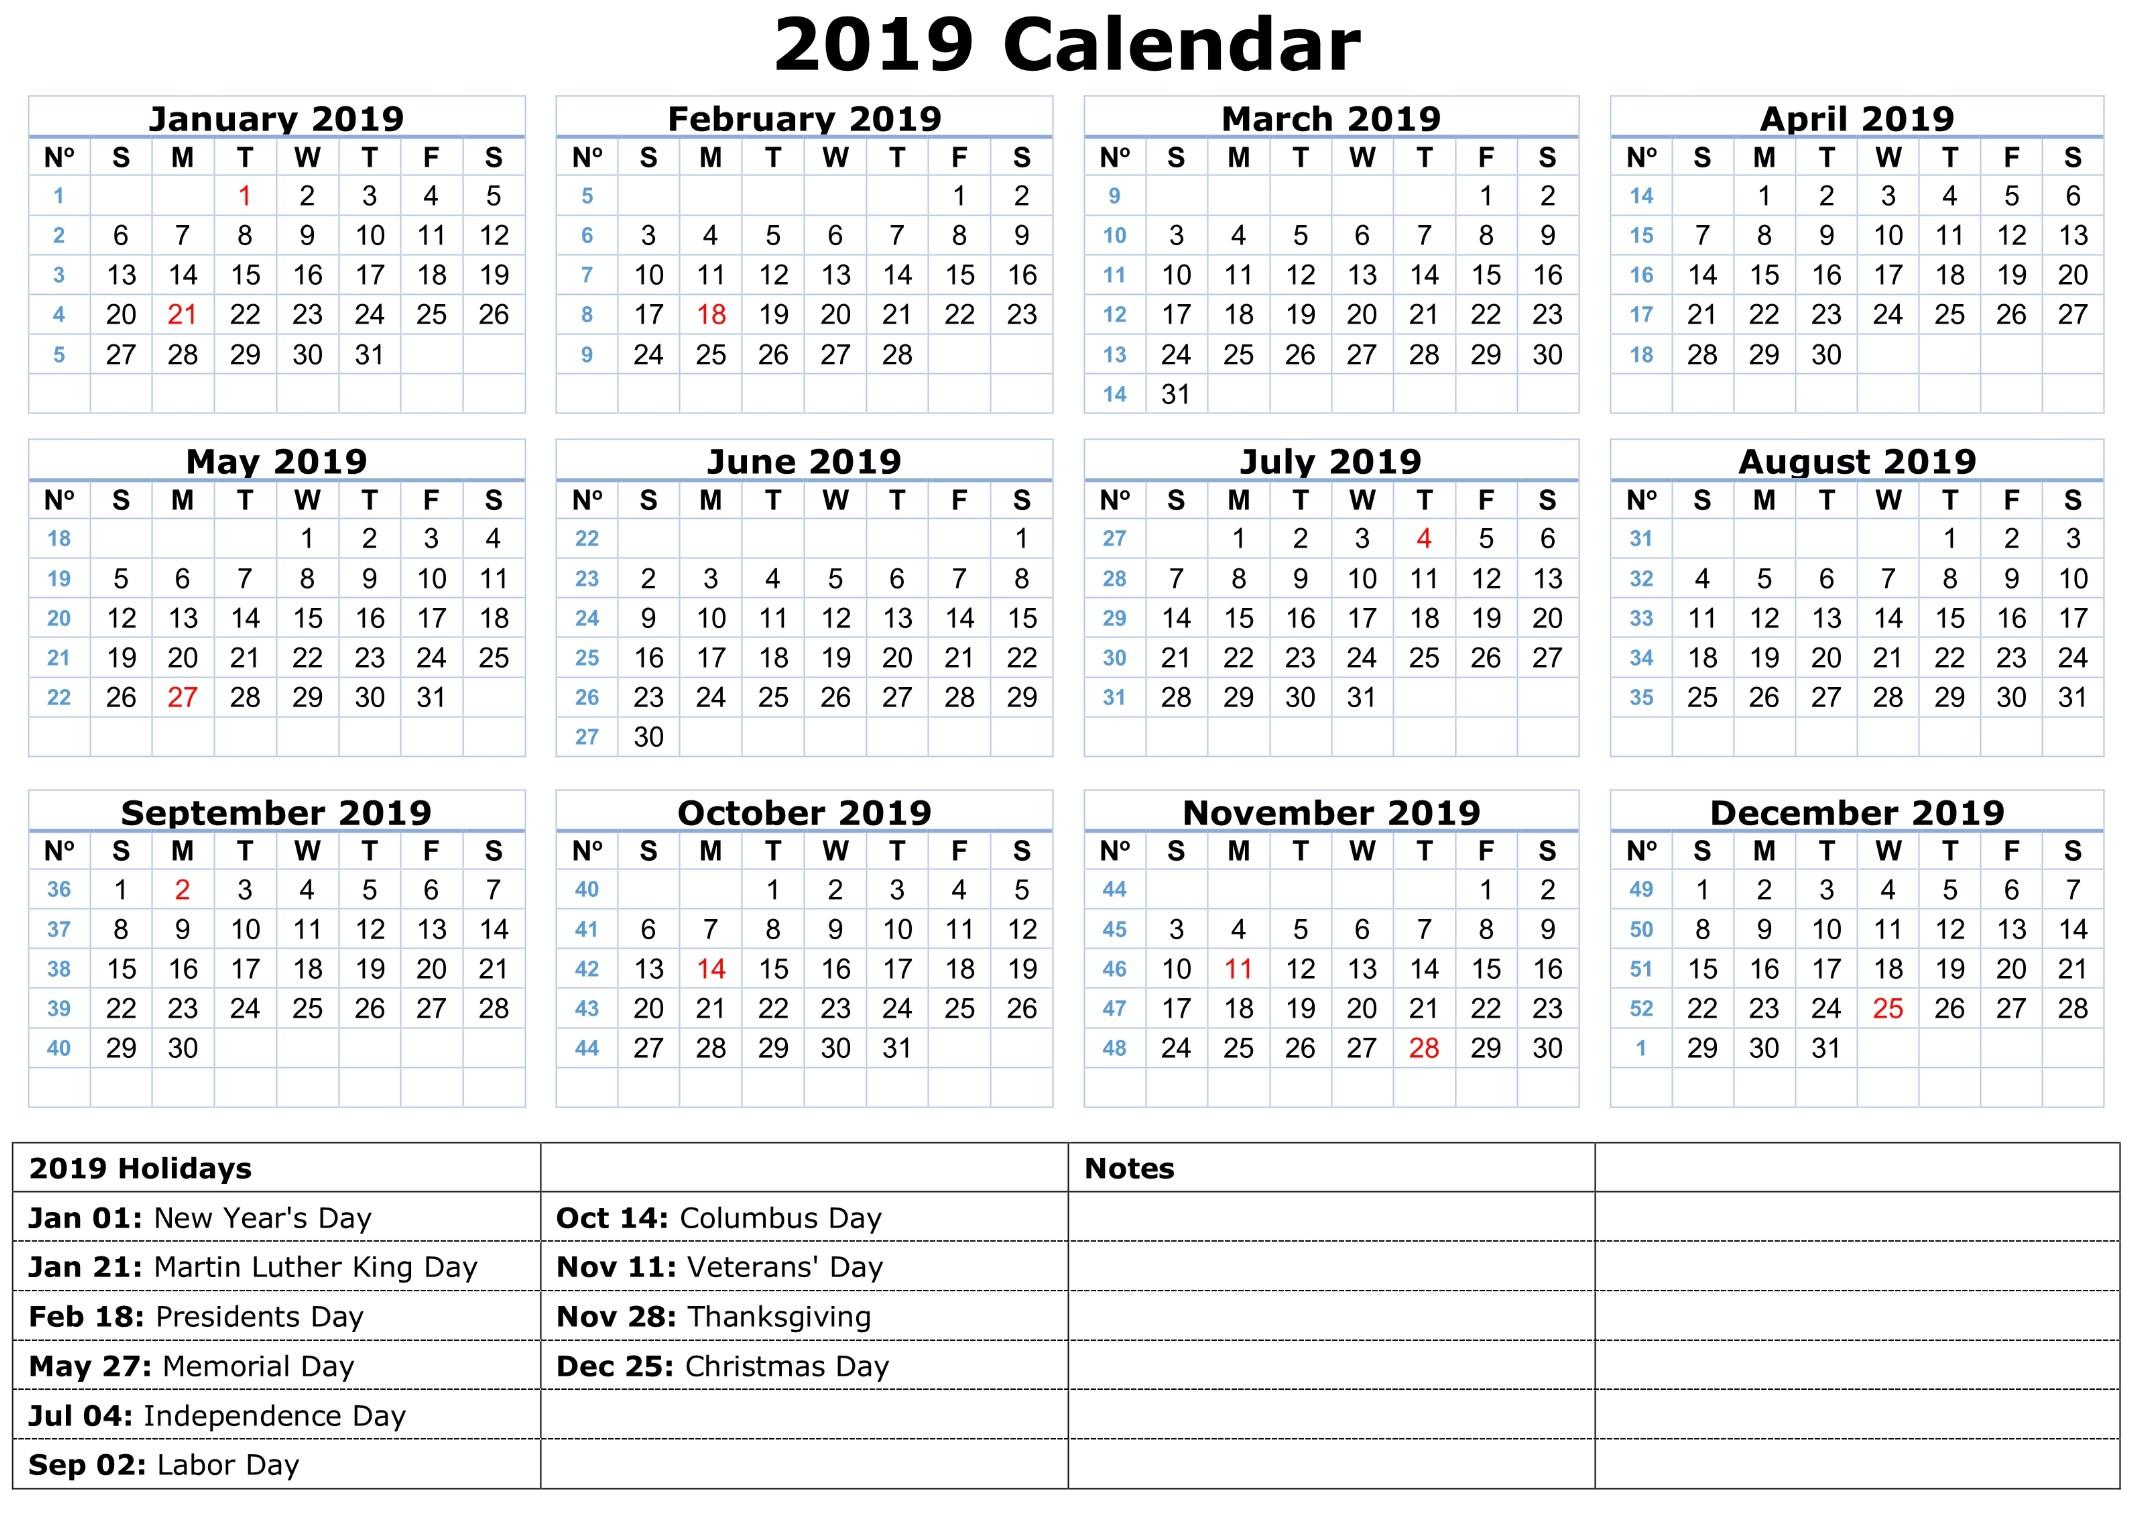 2019 Calendar AmazonAWS